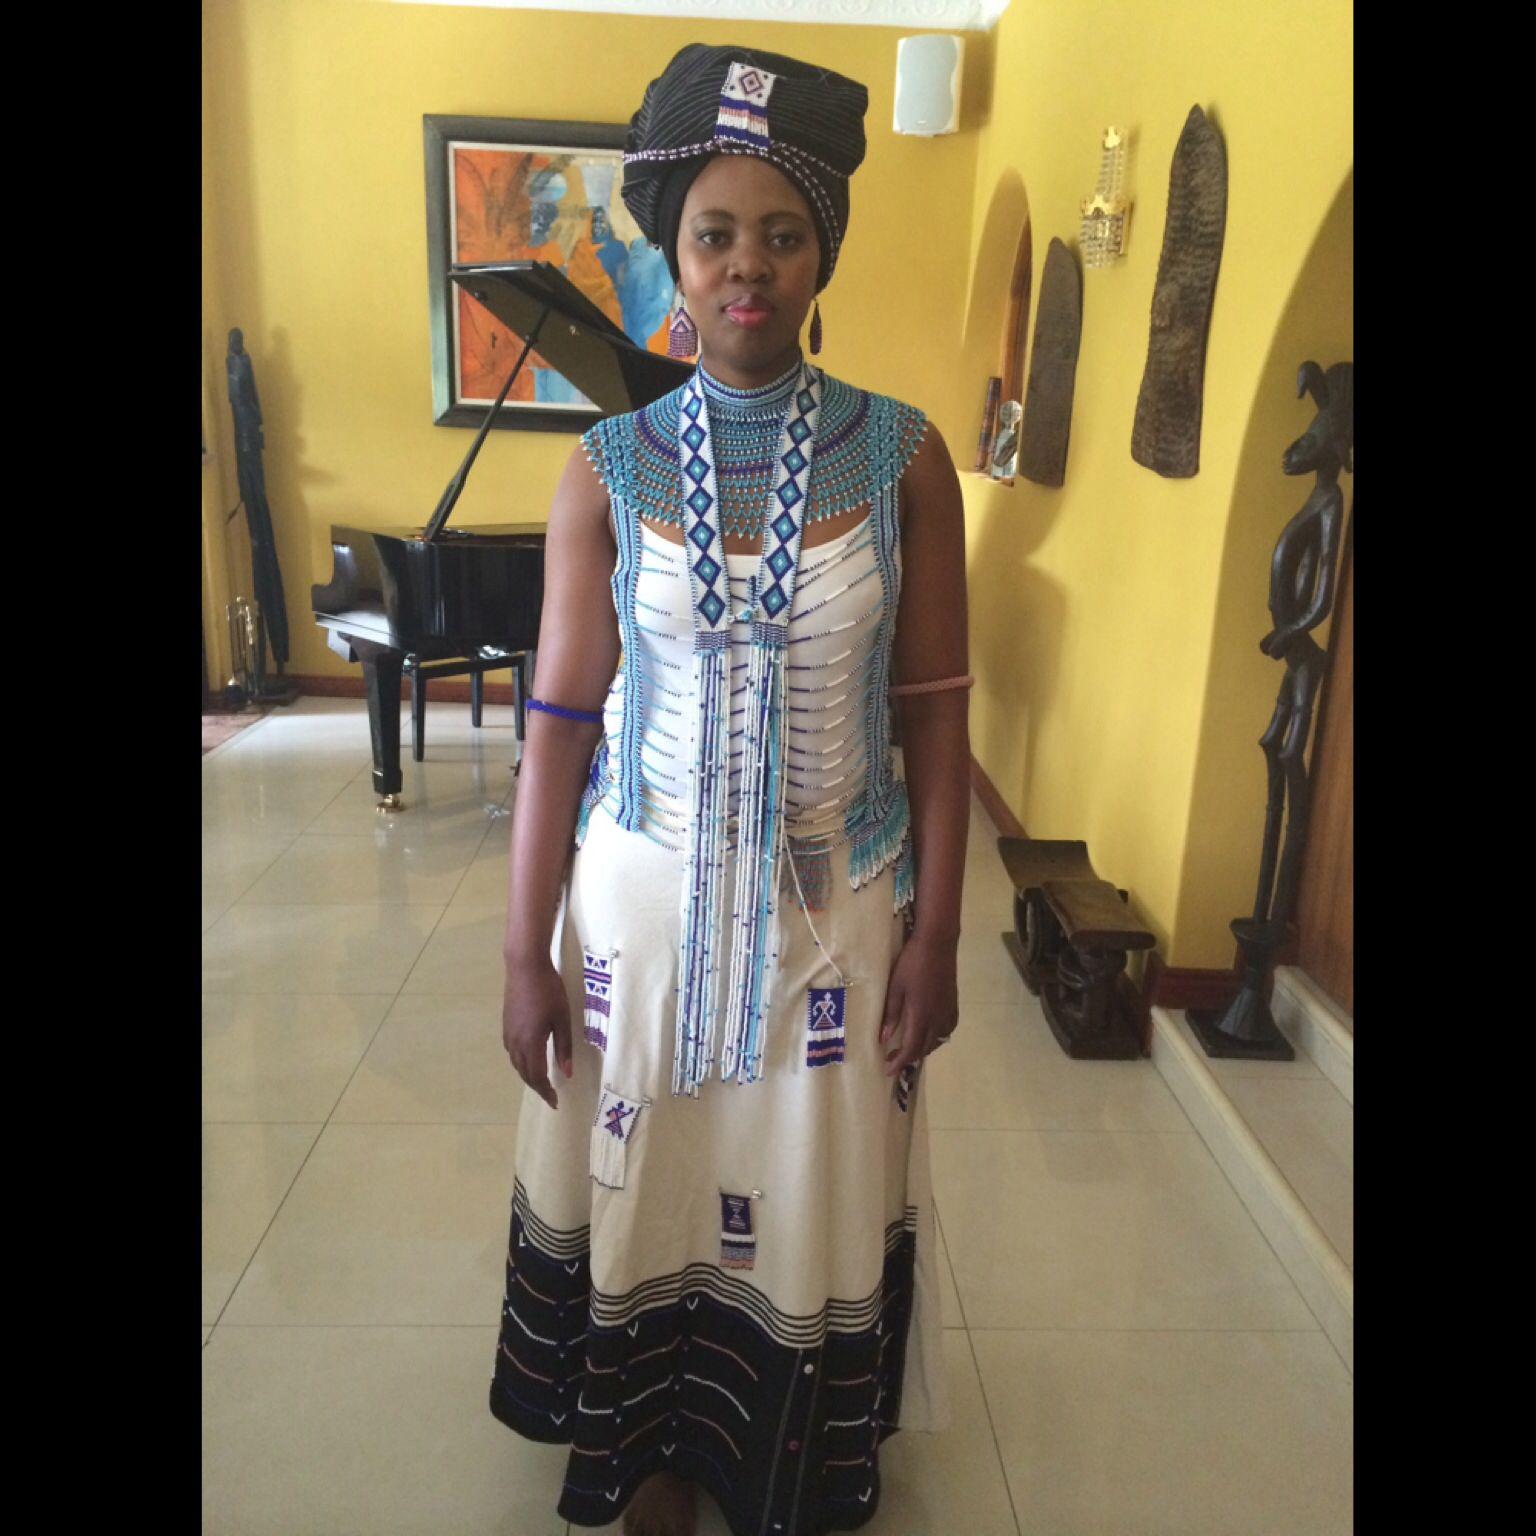 Traditional xhosa dress beads dresses pinterest xhosa traditional xhosa dress beads ccuart Images